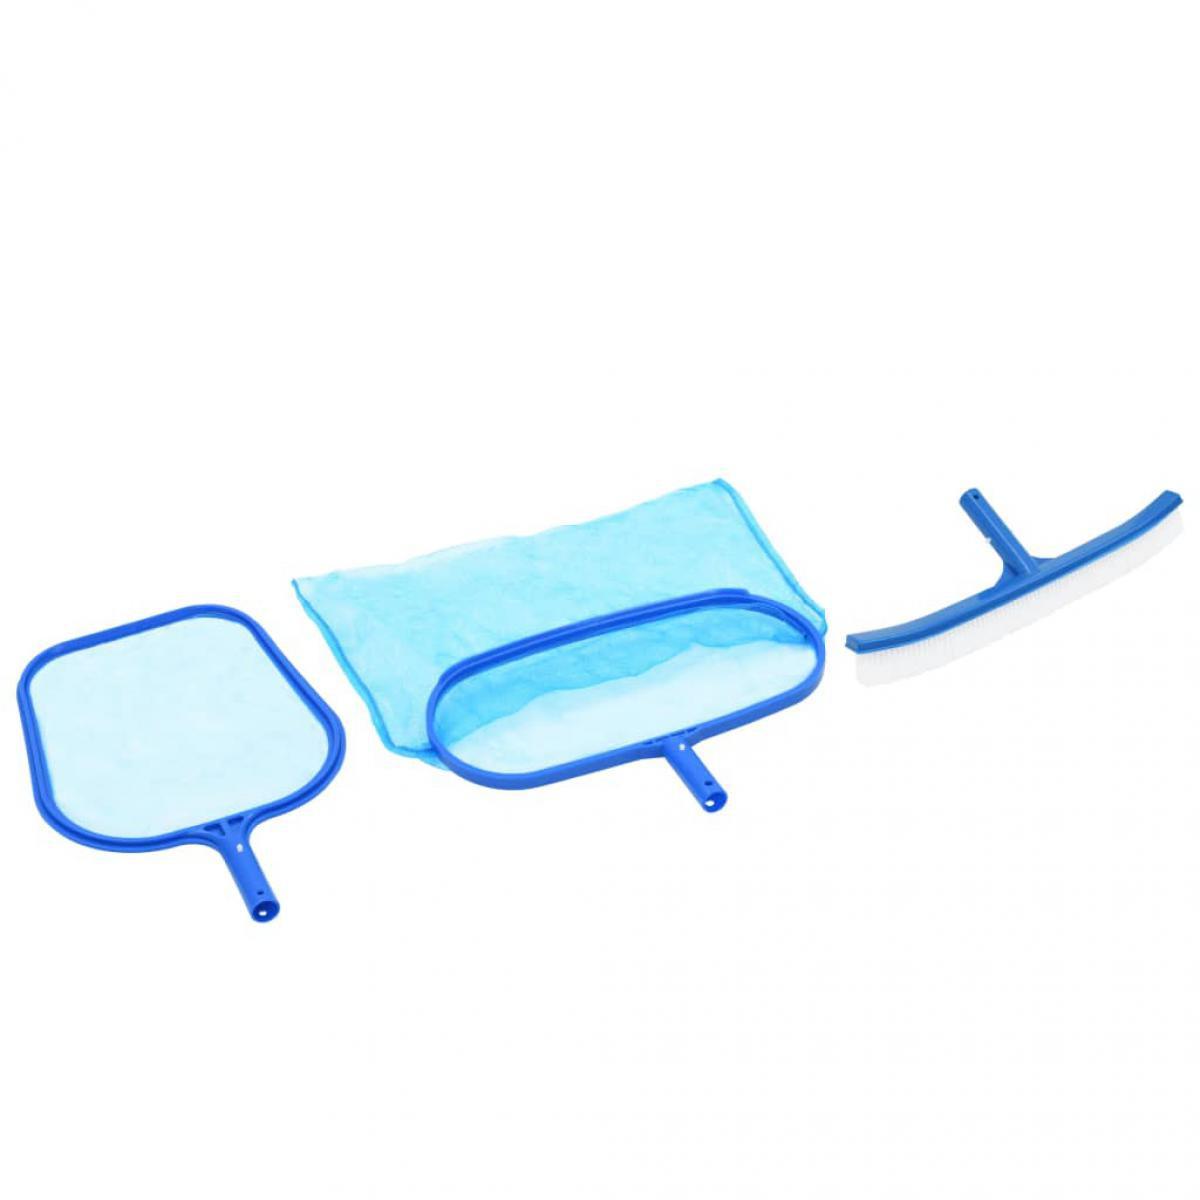 Vidaxl vidaXL Kit d'entretien de piscine 3 pcs